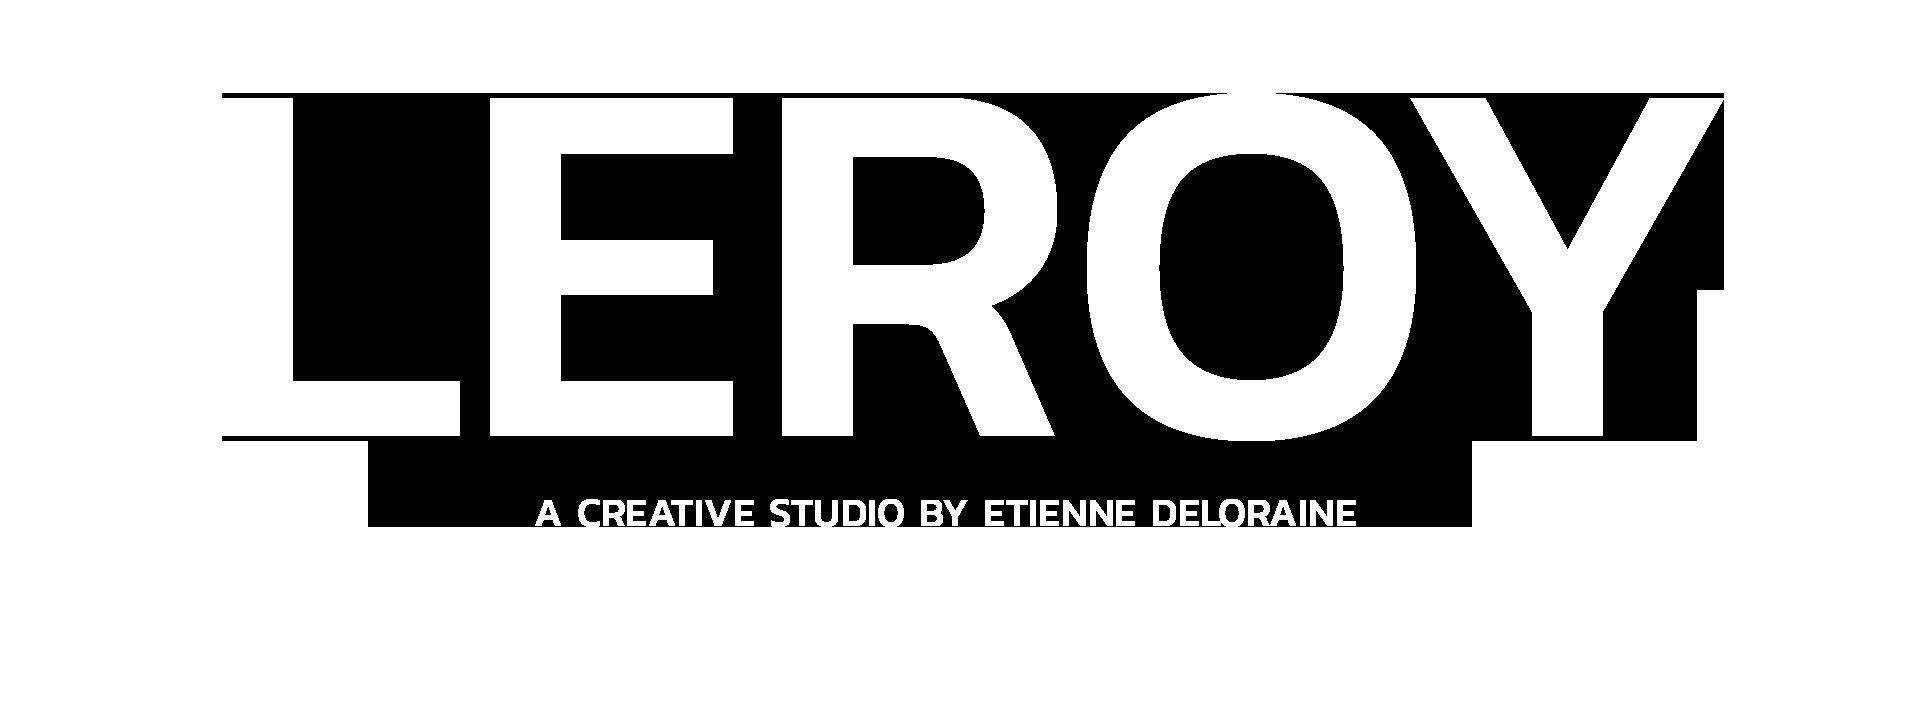 leroy-studio-etienne-deloraine-logo